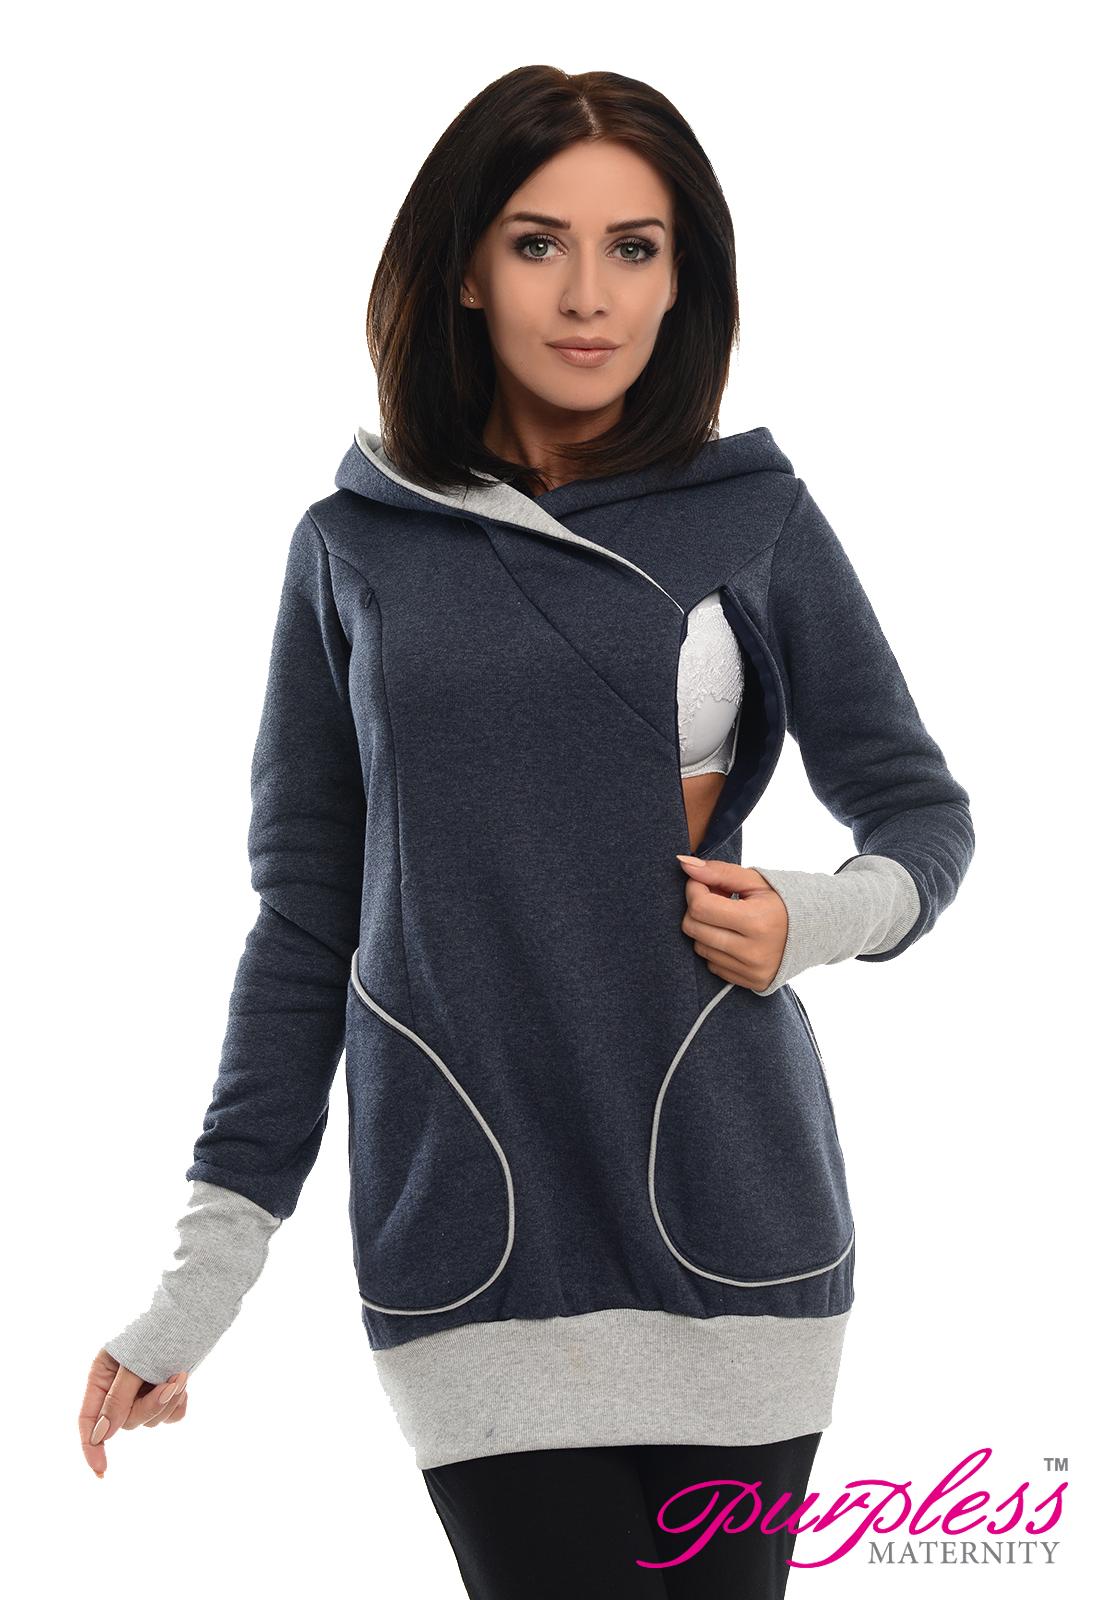 Purpless Maternity Pregnancy /& Nursing Sweatshirt With Cross Over Neckline B9056